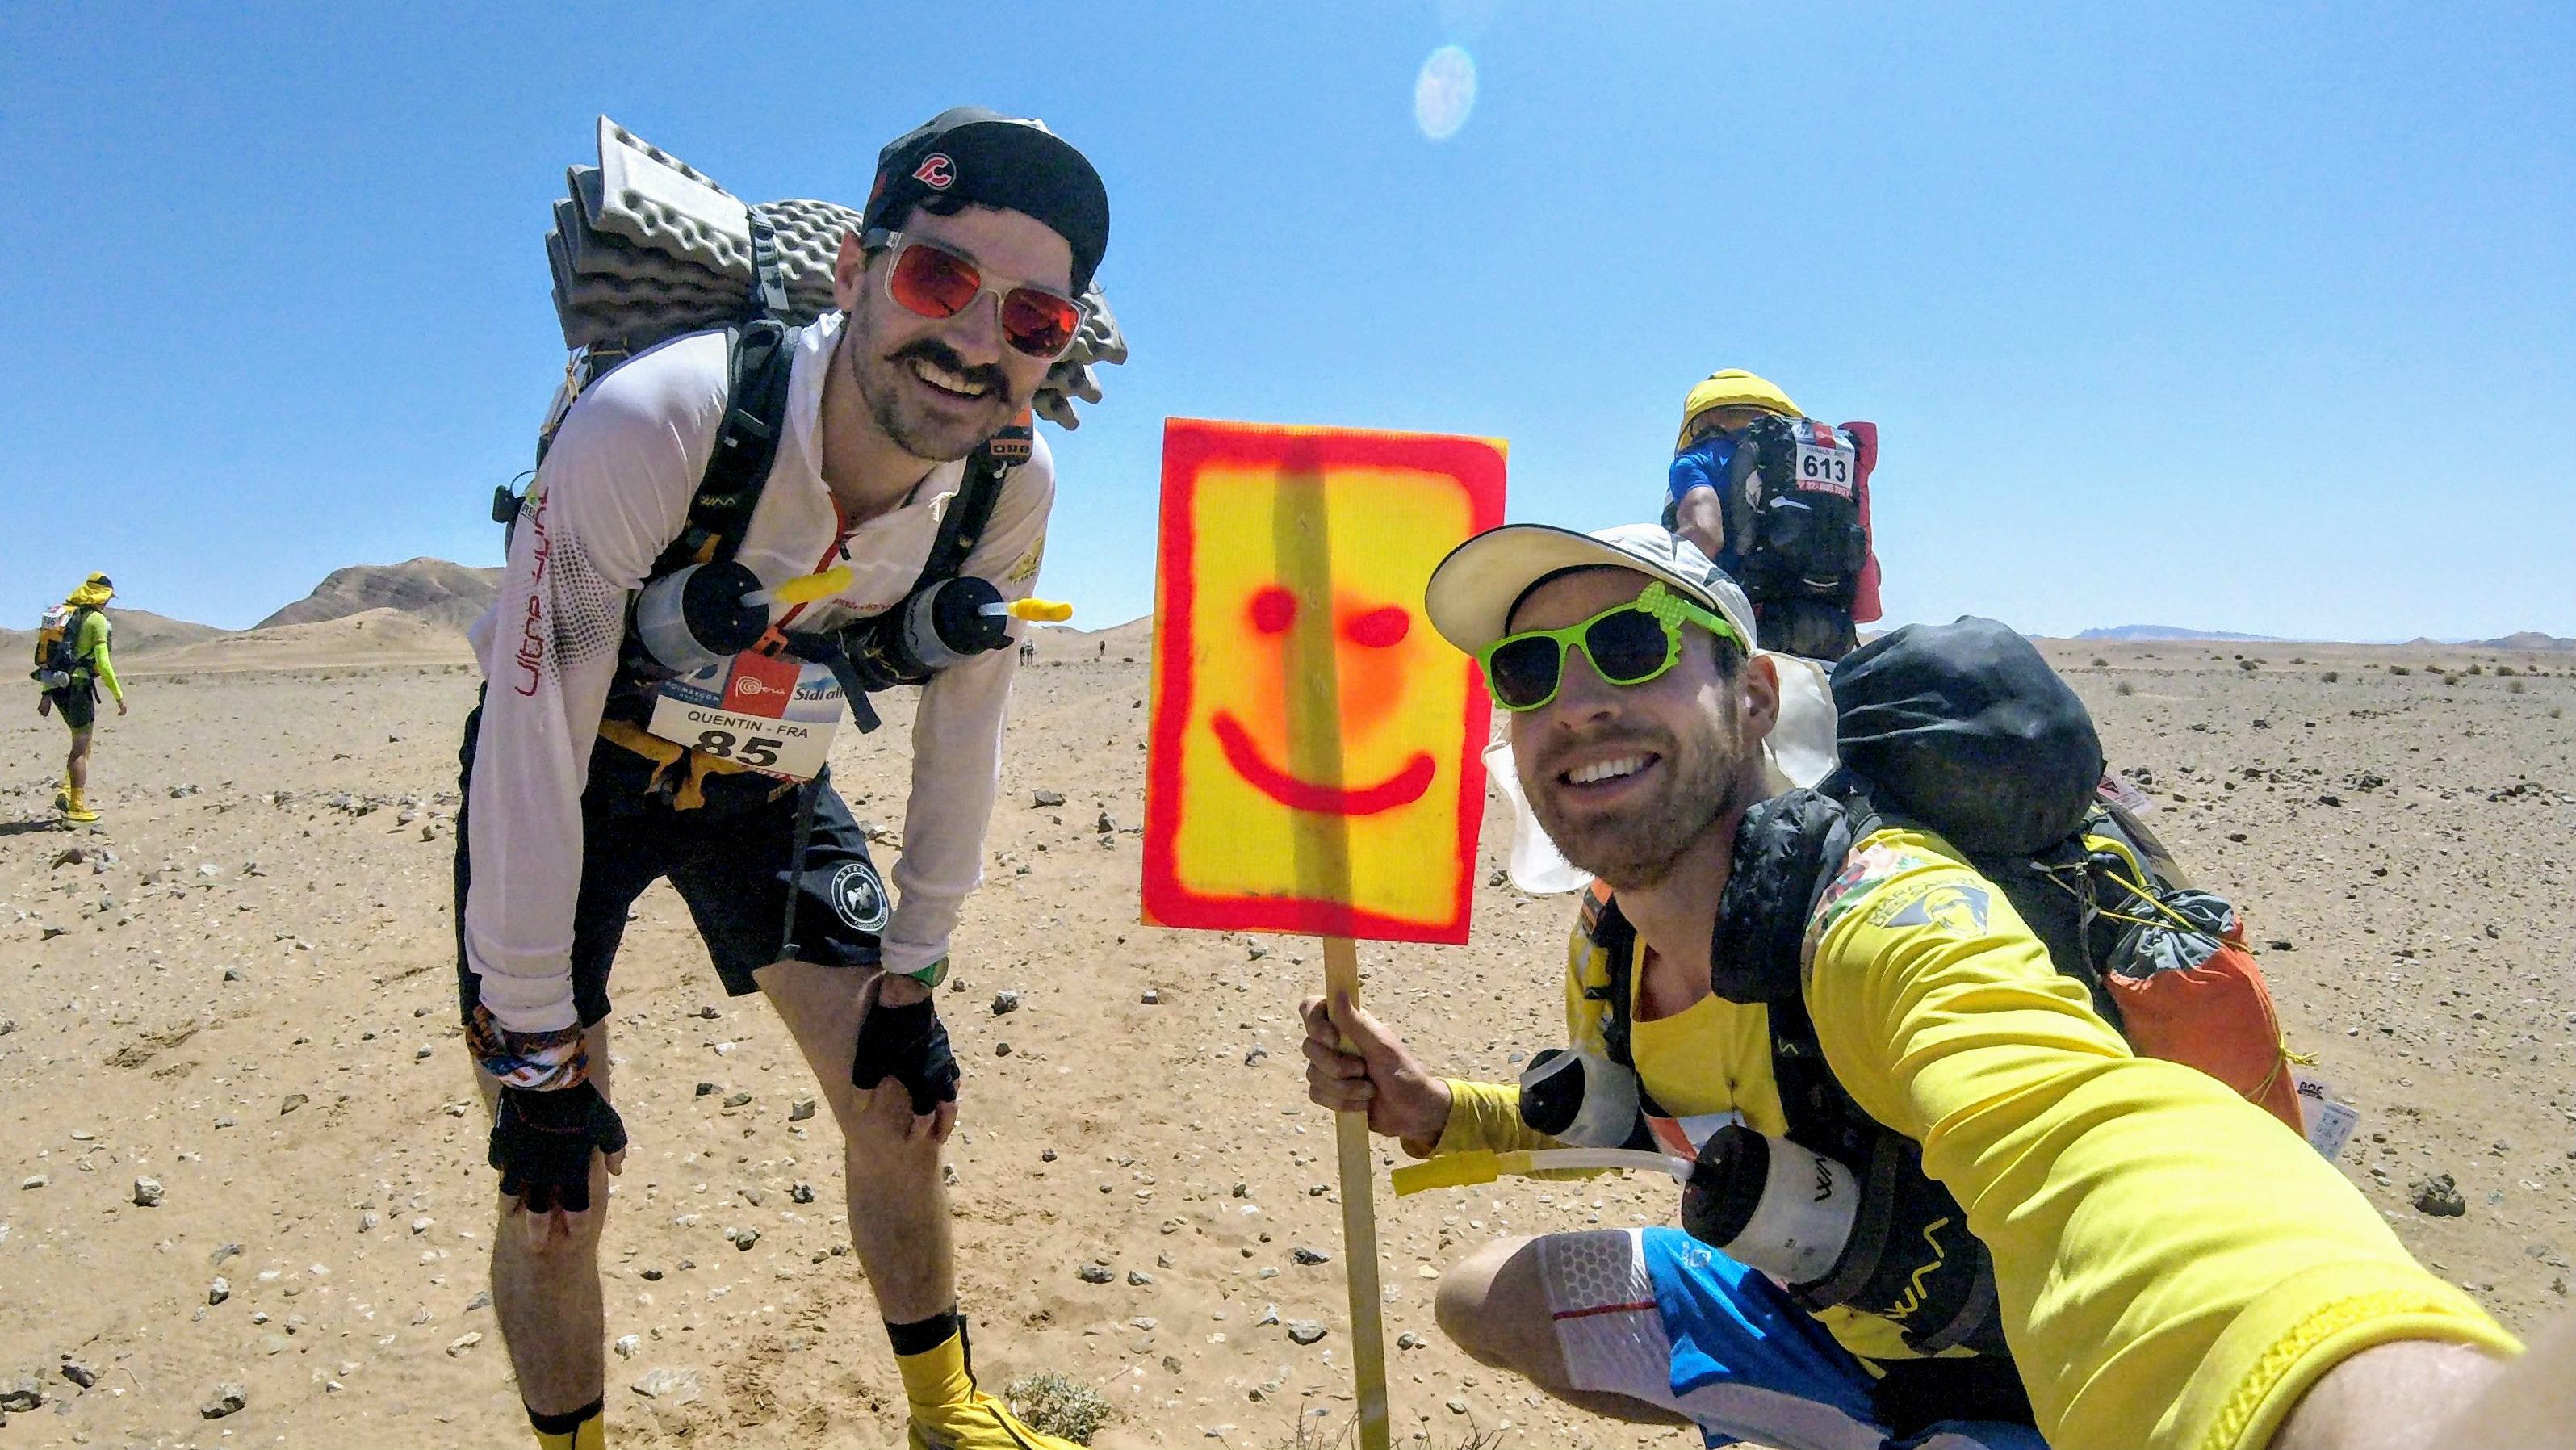 Quentin Brue (gauche) et Thomas Duhamel (droite) - Photo: Courtoisie